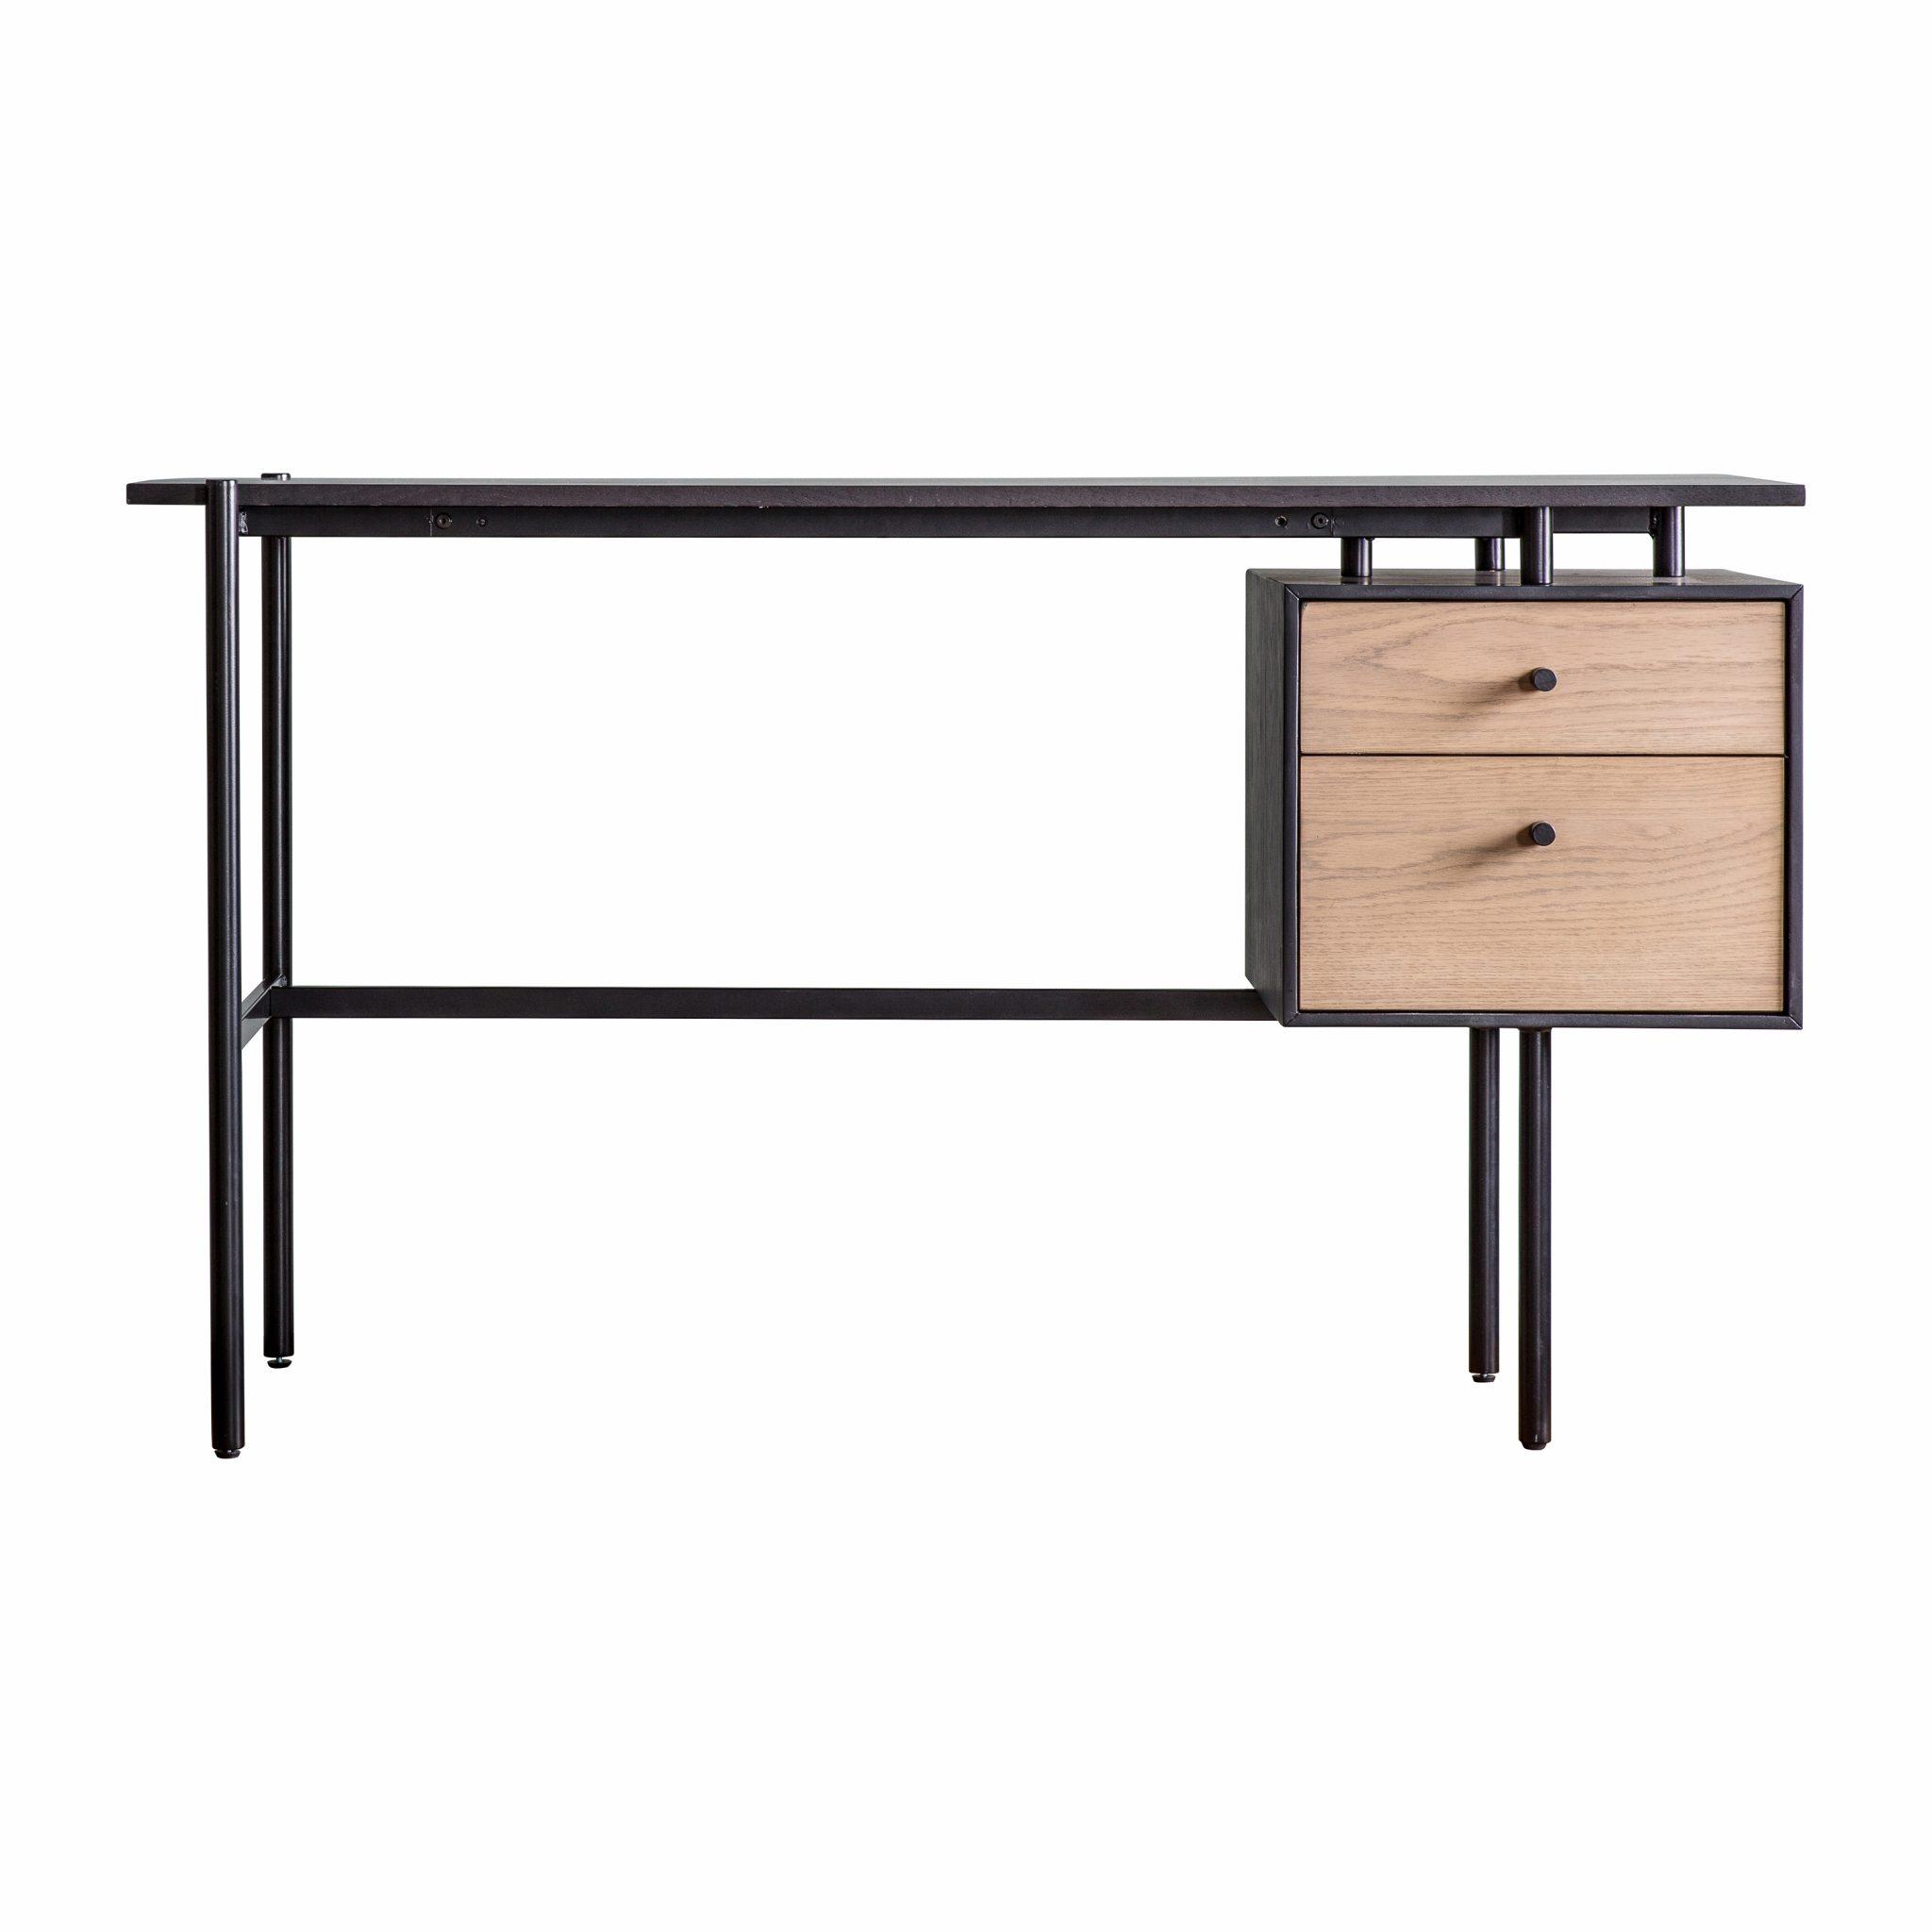 Image of Cadbury Light Wood 2 Drawer Desk - Black